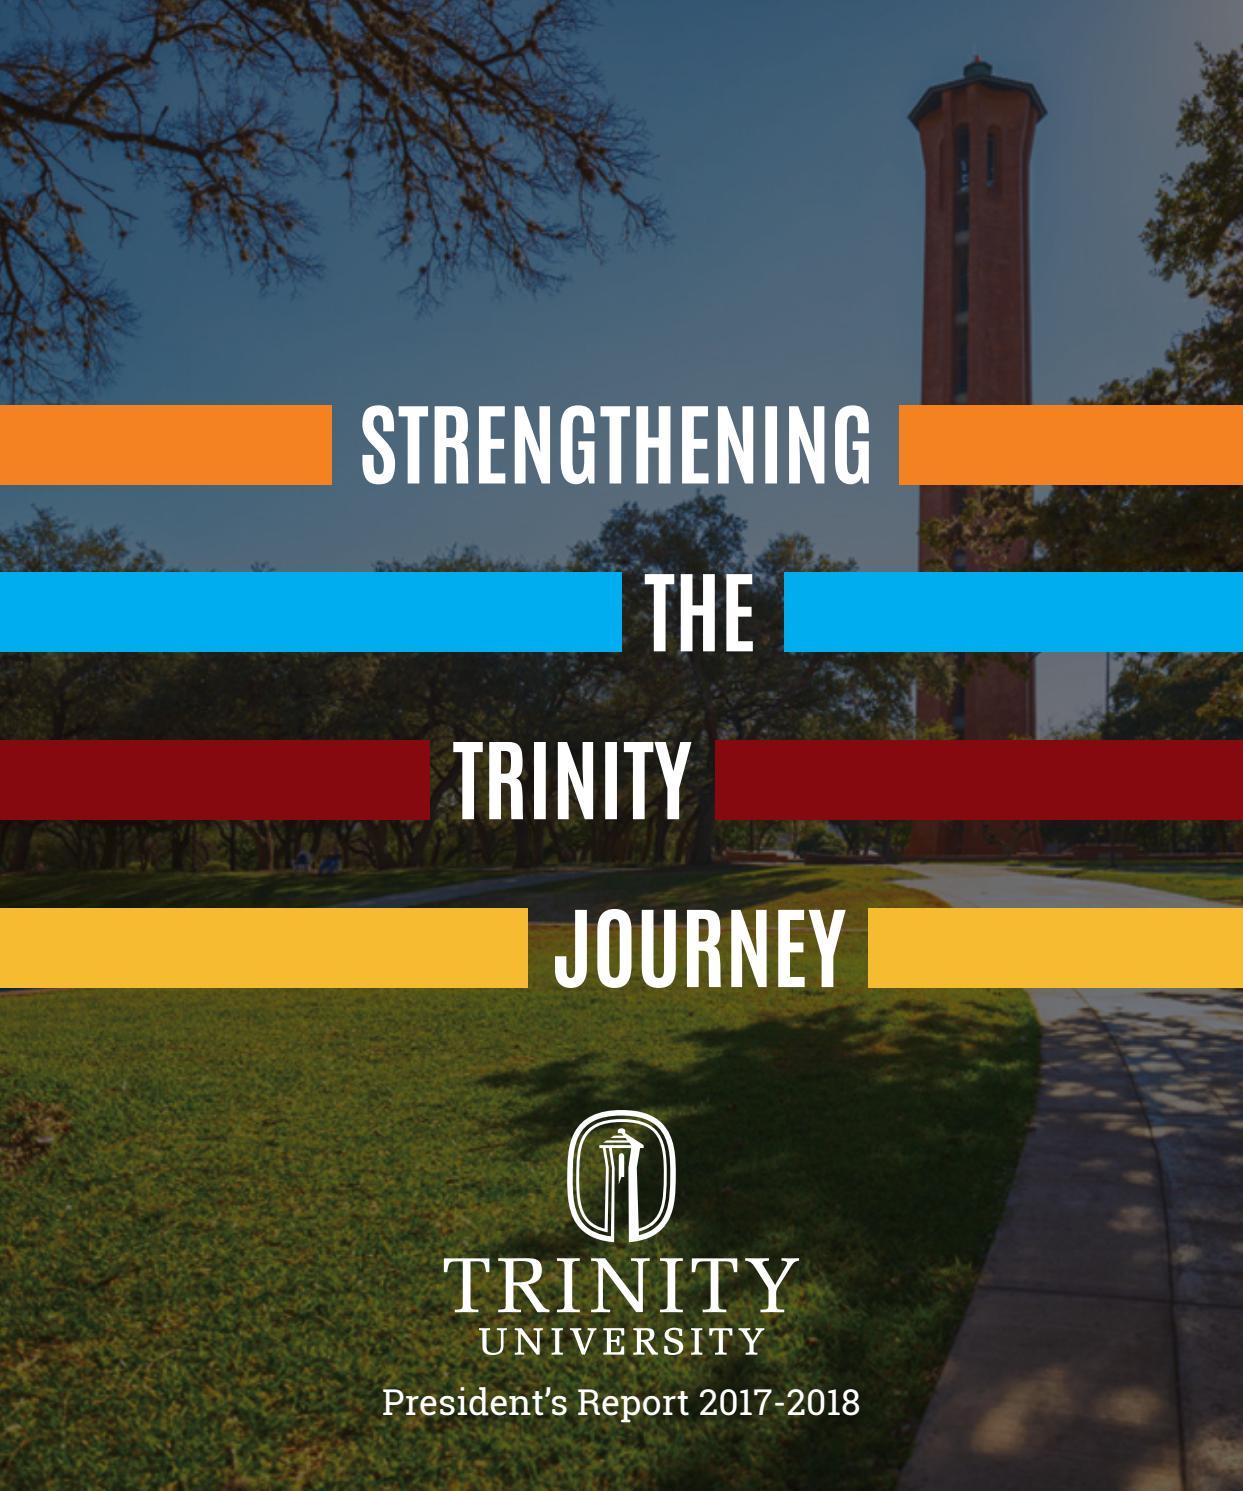 Trinity University President's Report, 2017-2018 by Trinity